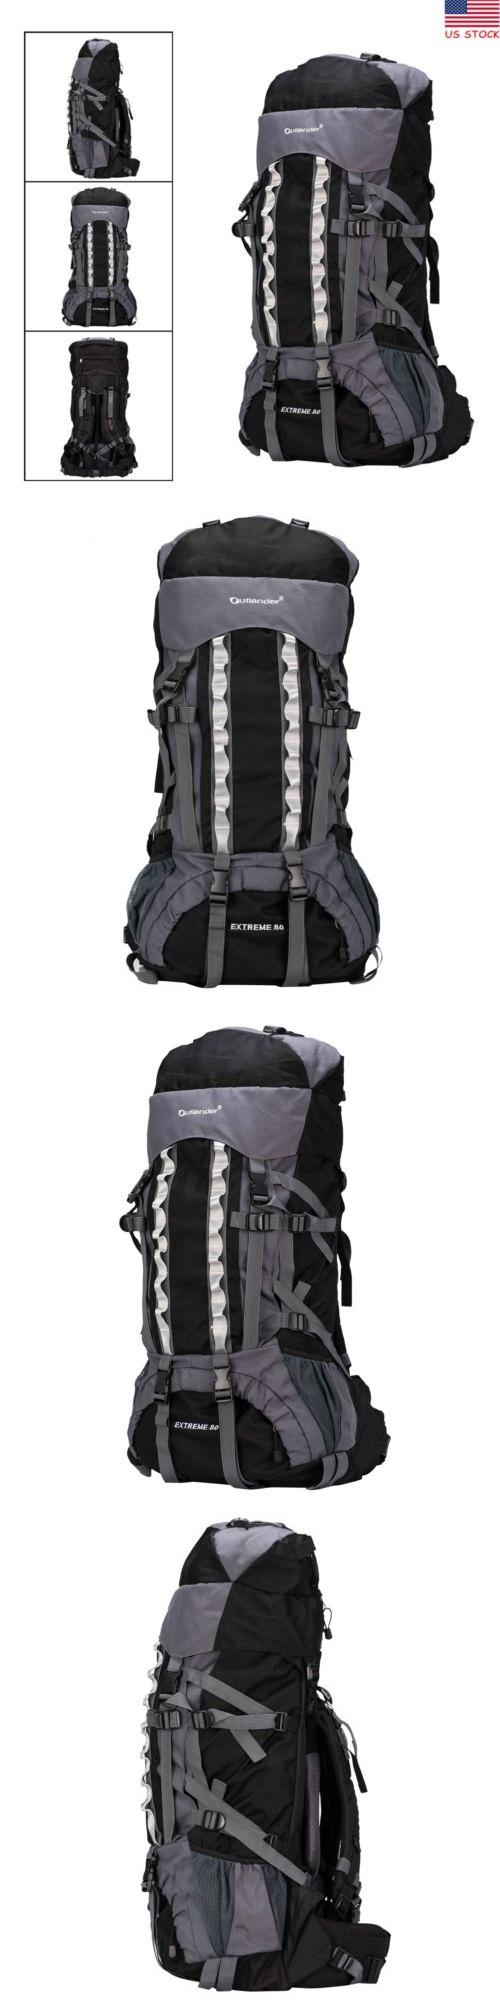 Backpacks l waterproof outdoor hiking camping travel bag